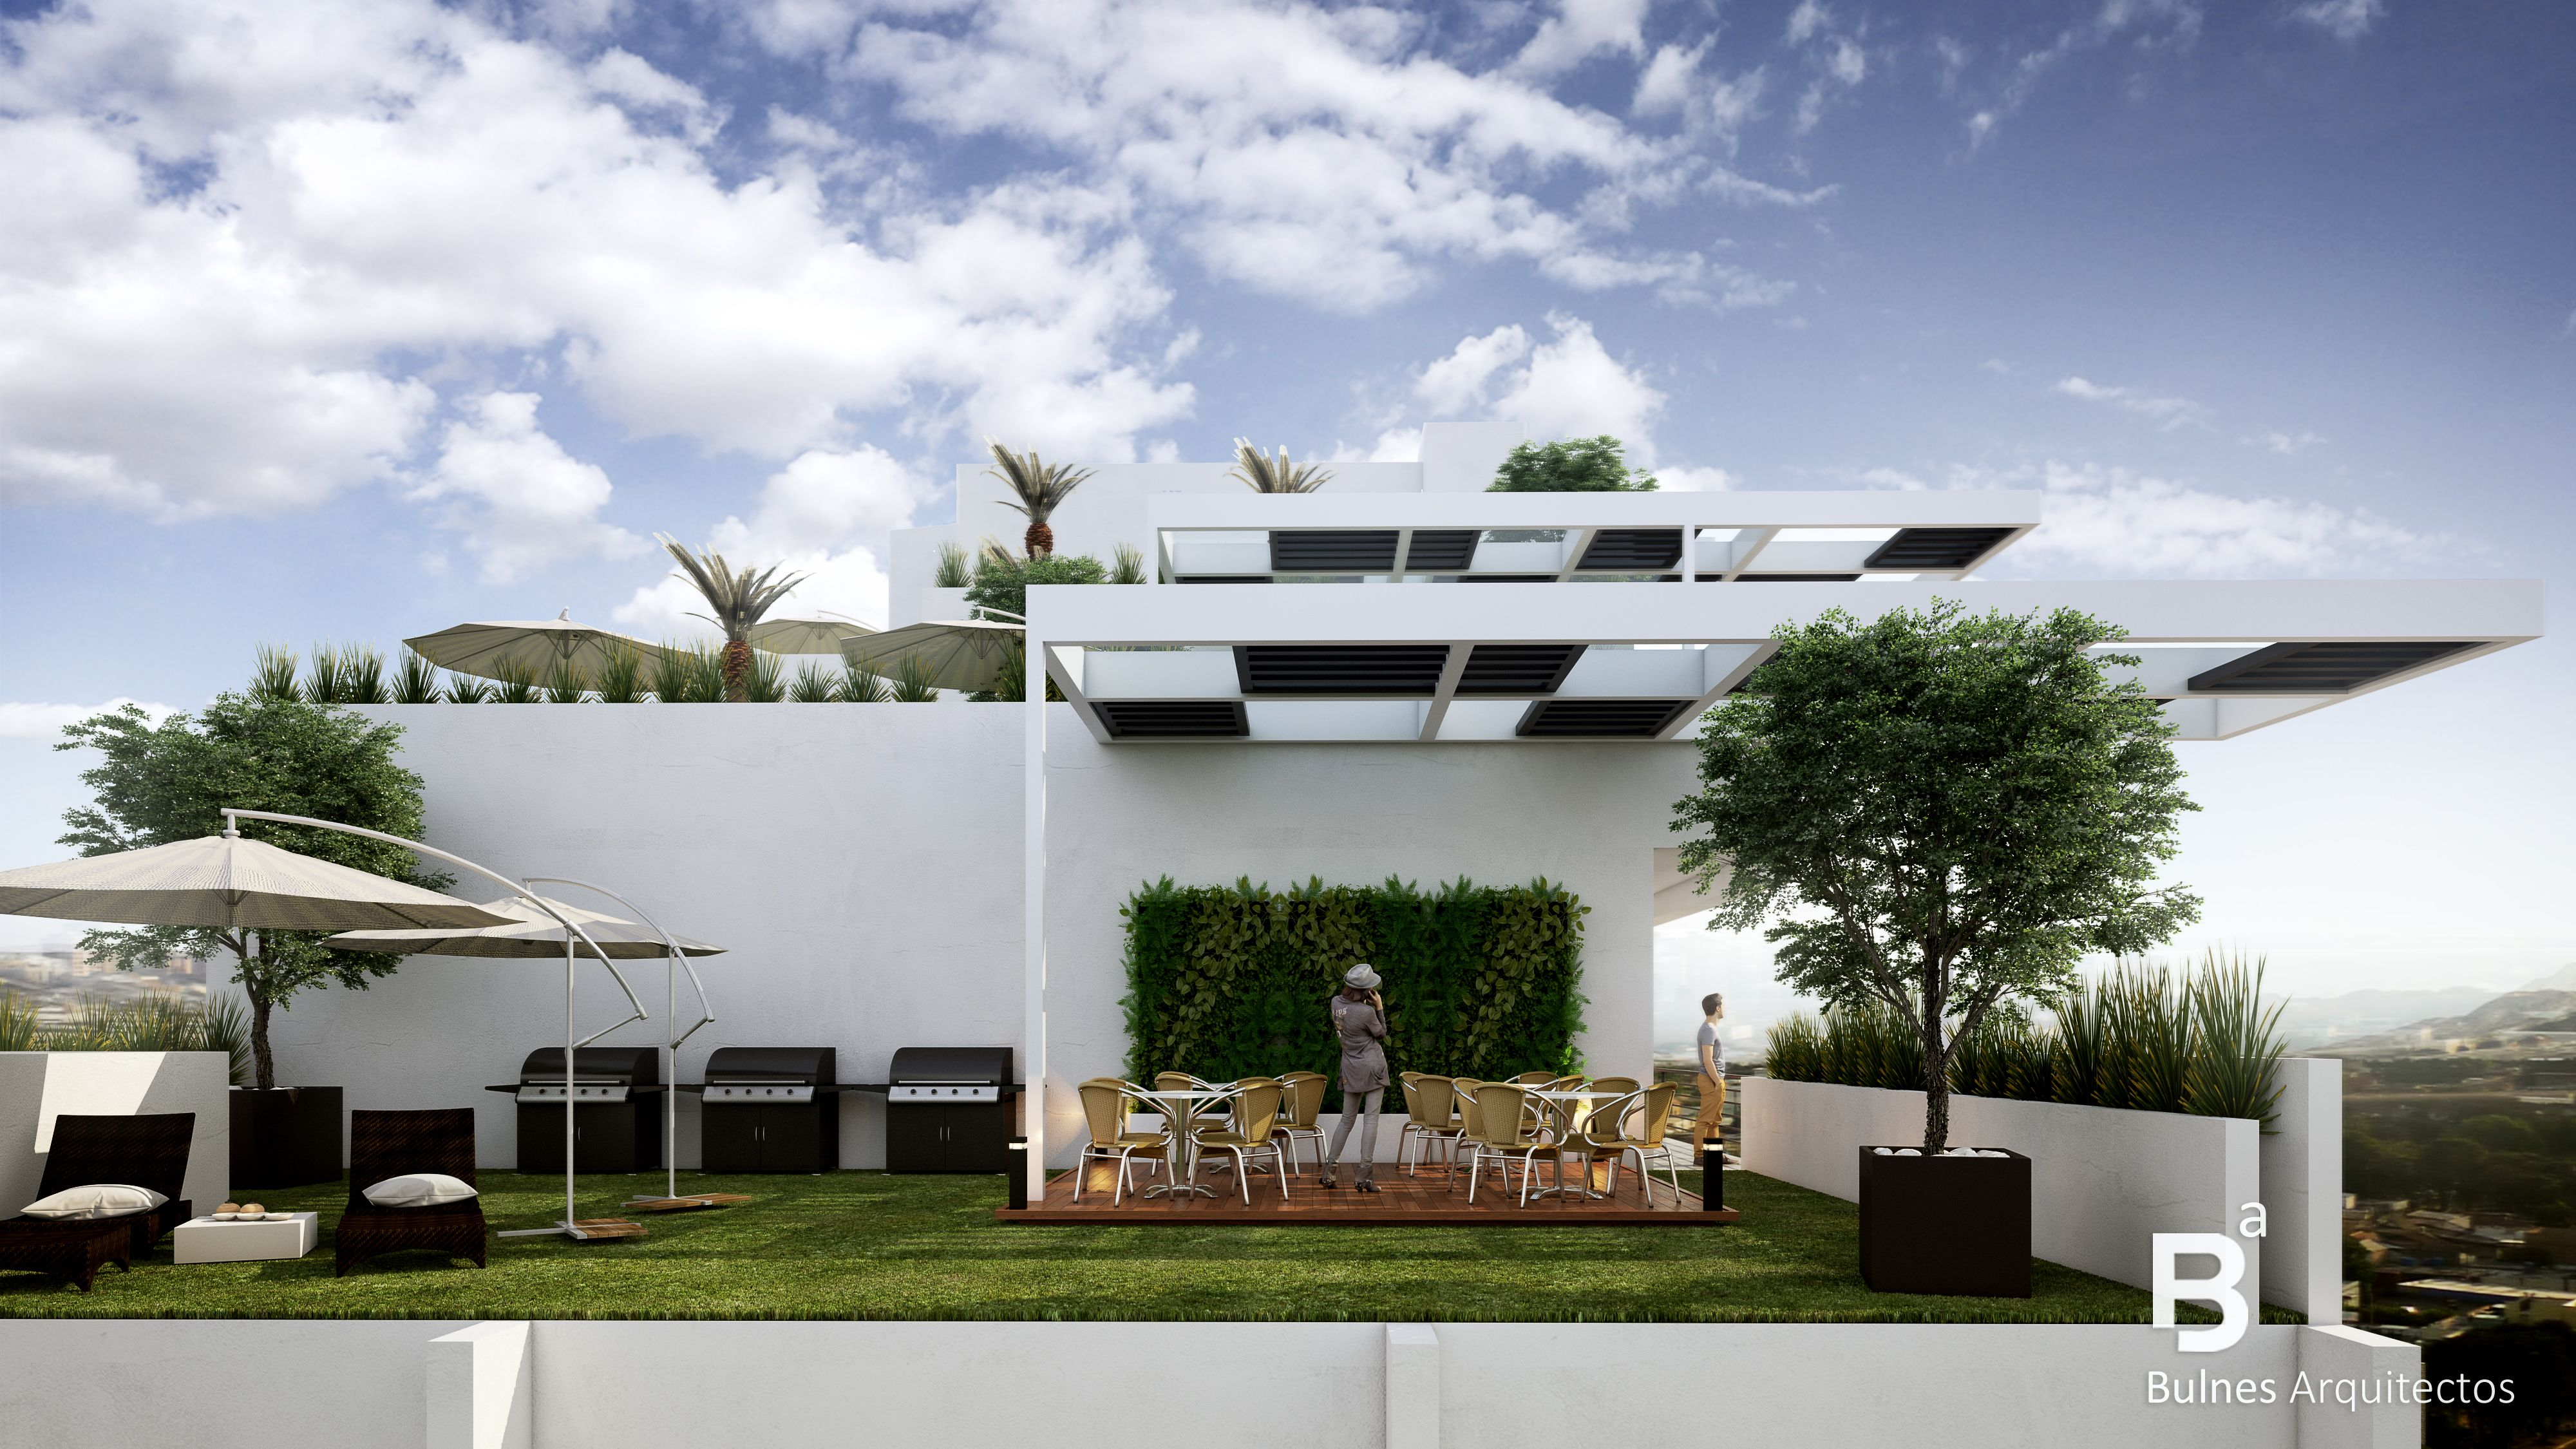 #BulnesArquitectos #Bulnes #Arquitectos #Puebla #Arquitectura, #BulnesBienesRaíces #TorreQtzal